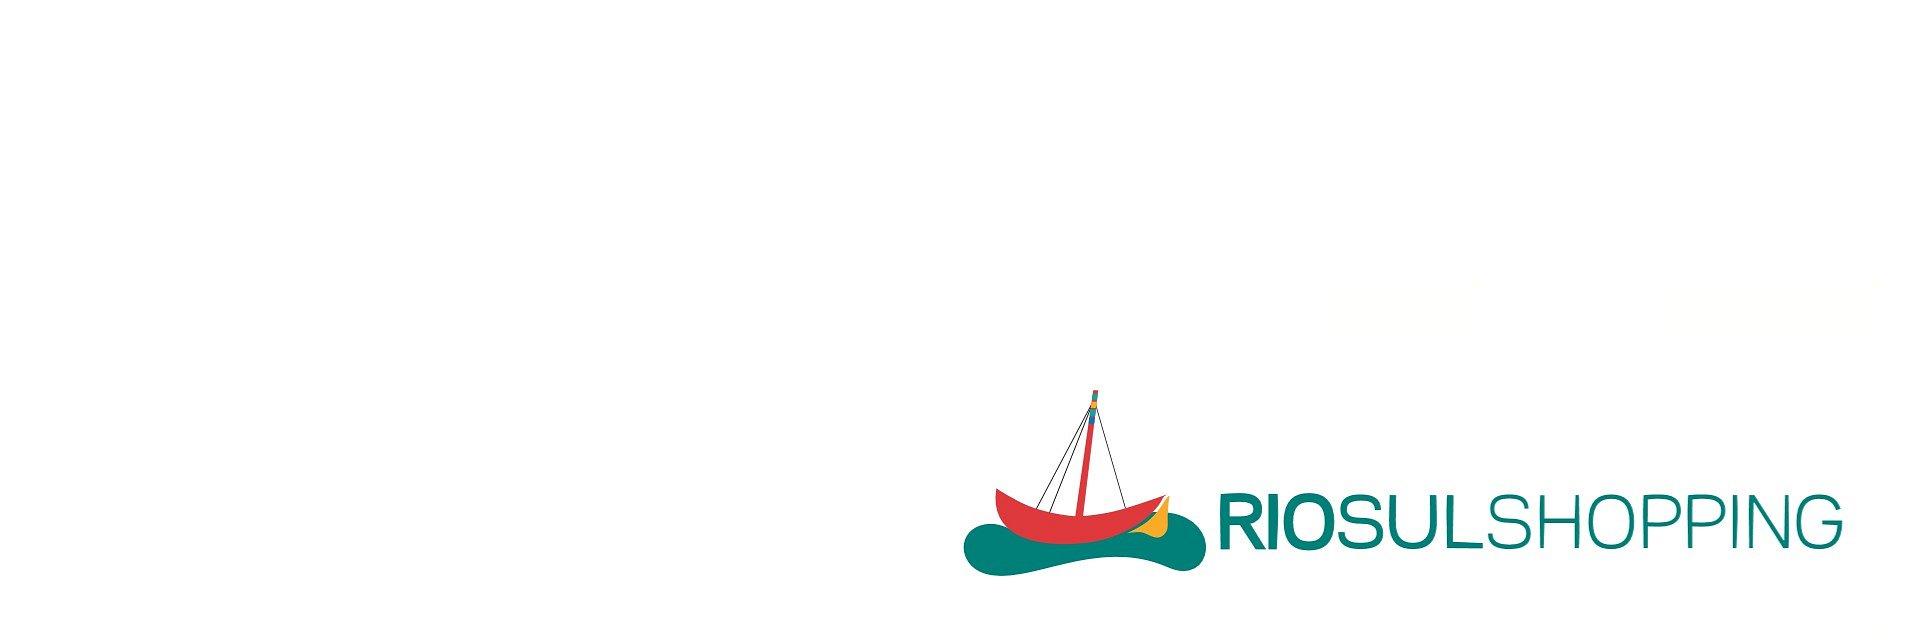 RioSul Shopping recebe Showcooking de Healthy Burgers!